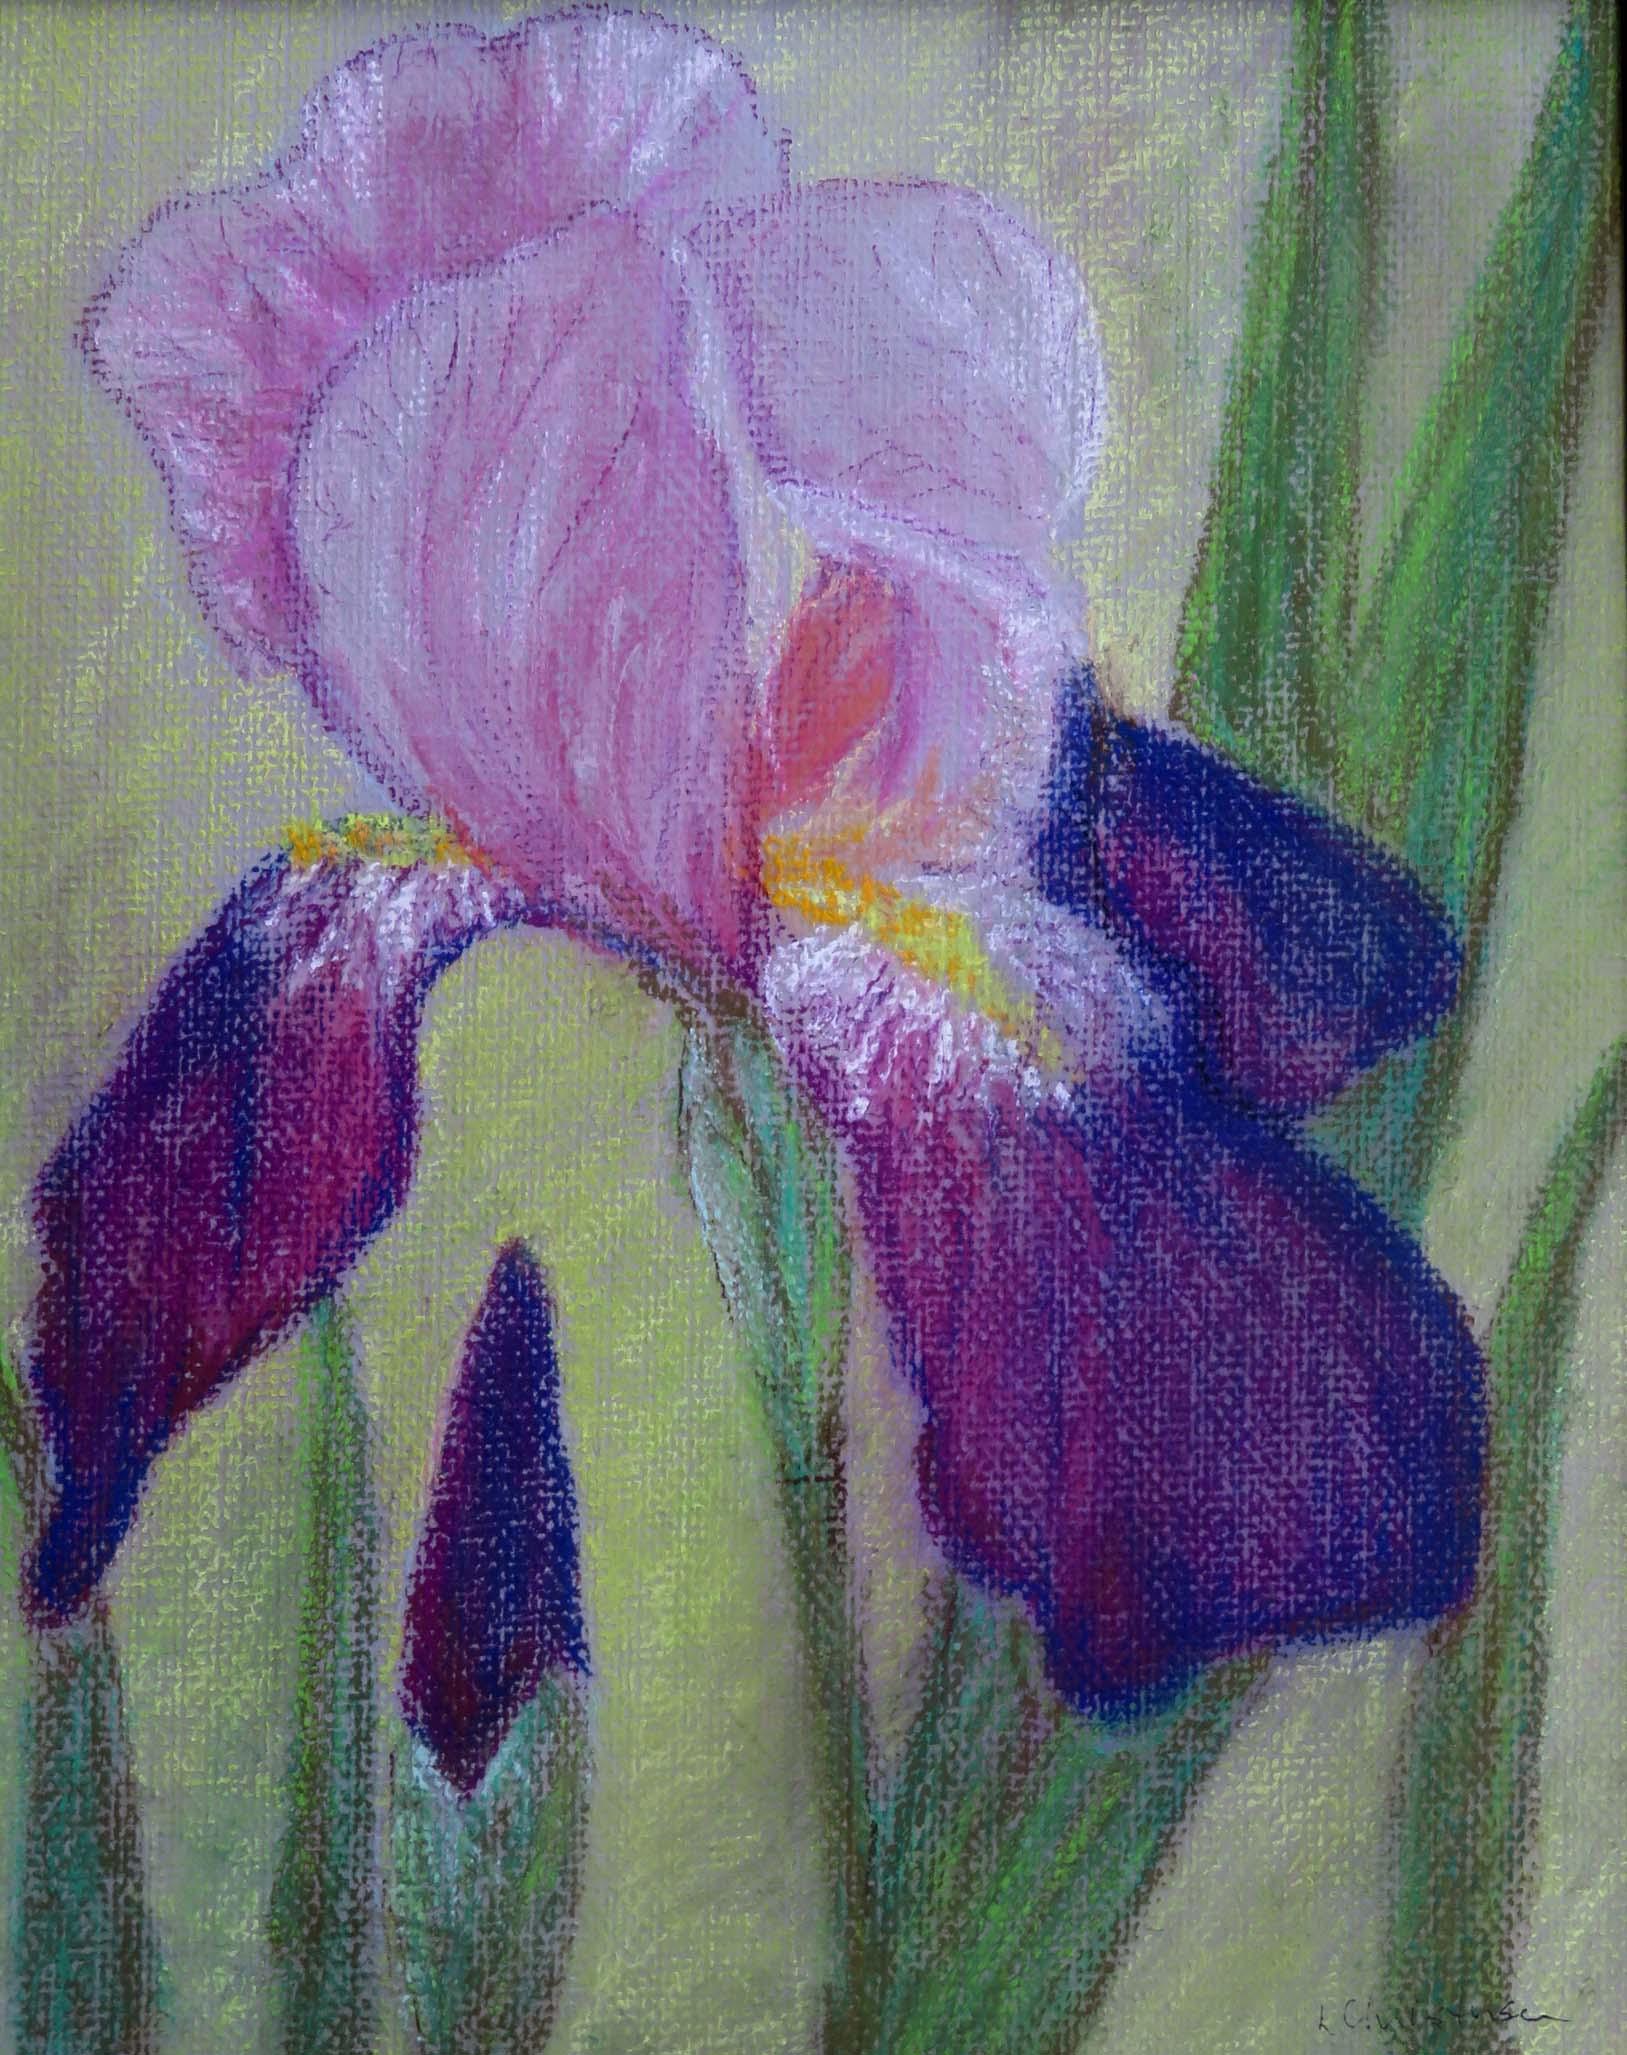 Royal Purple Iris by Libby J   Christensen nfs